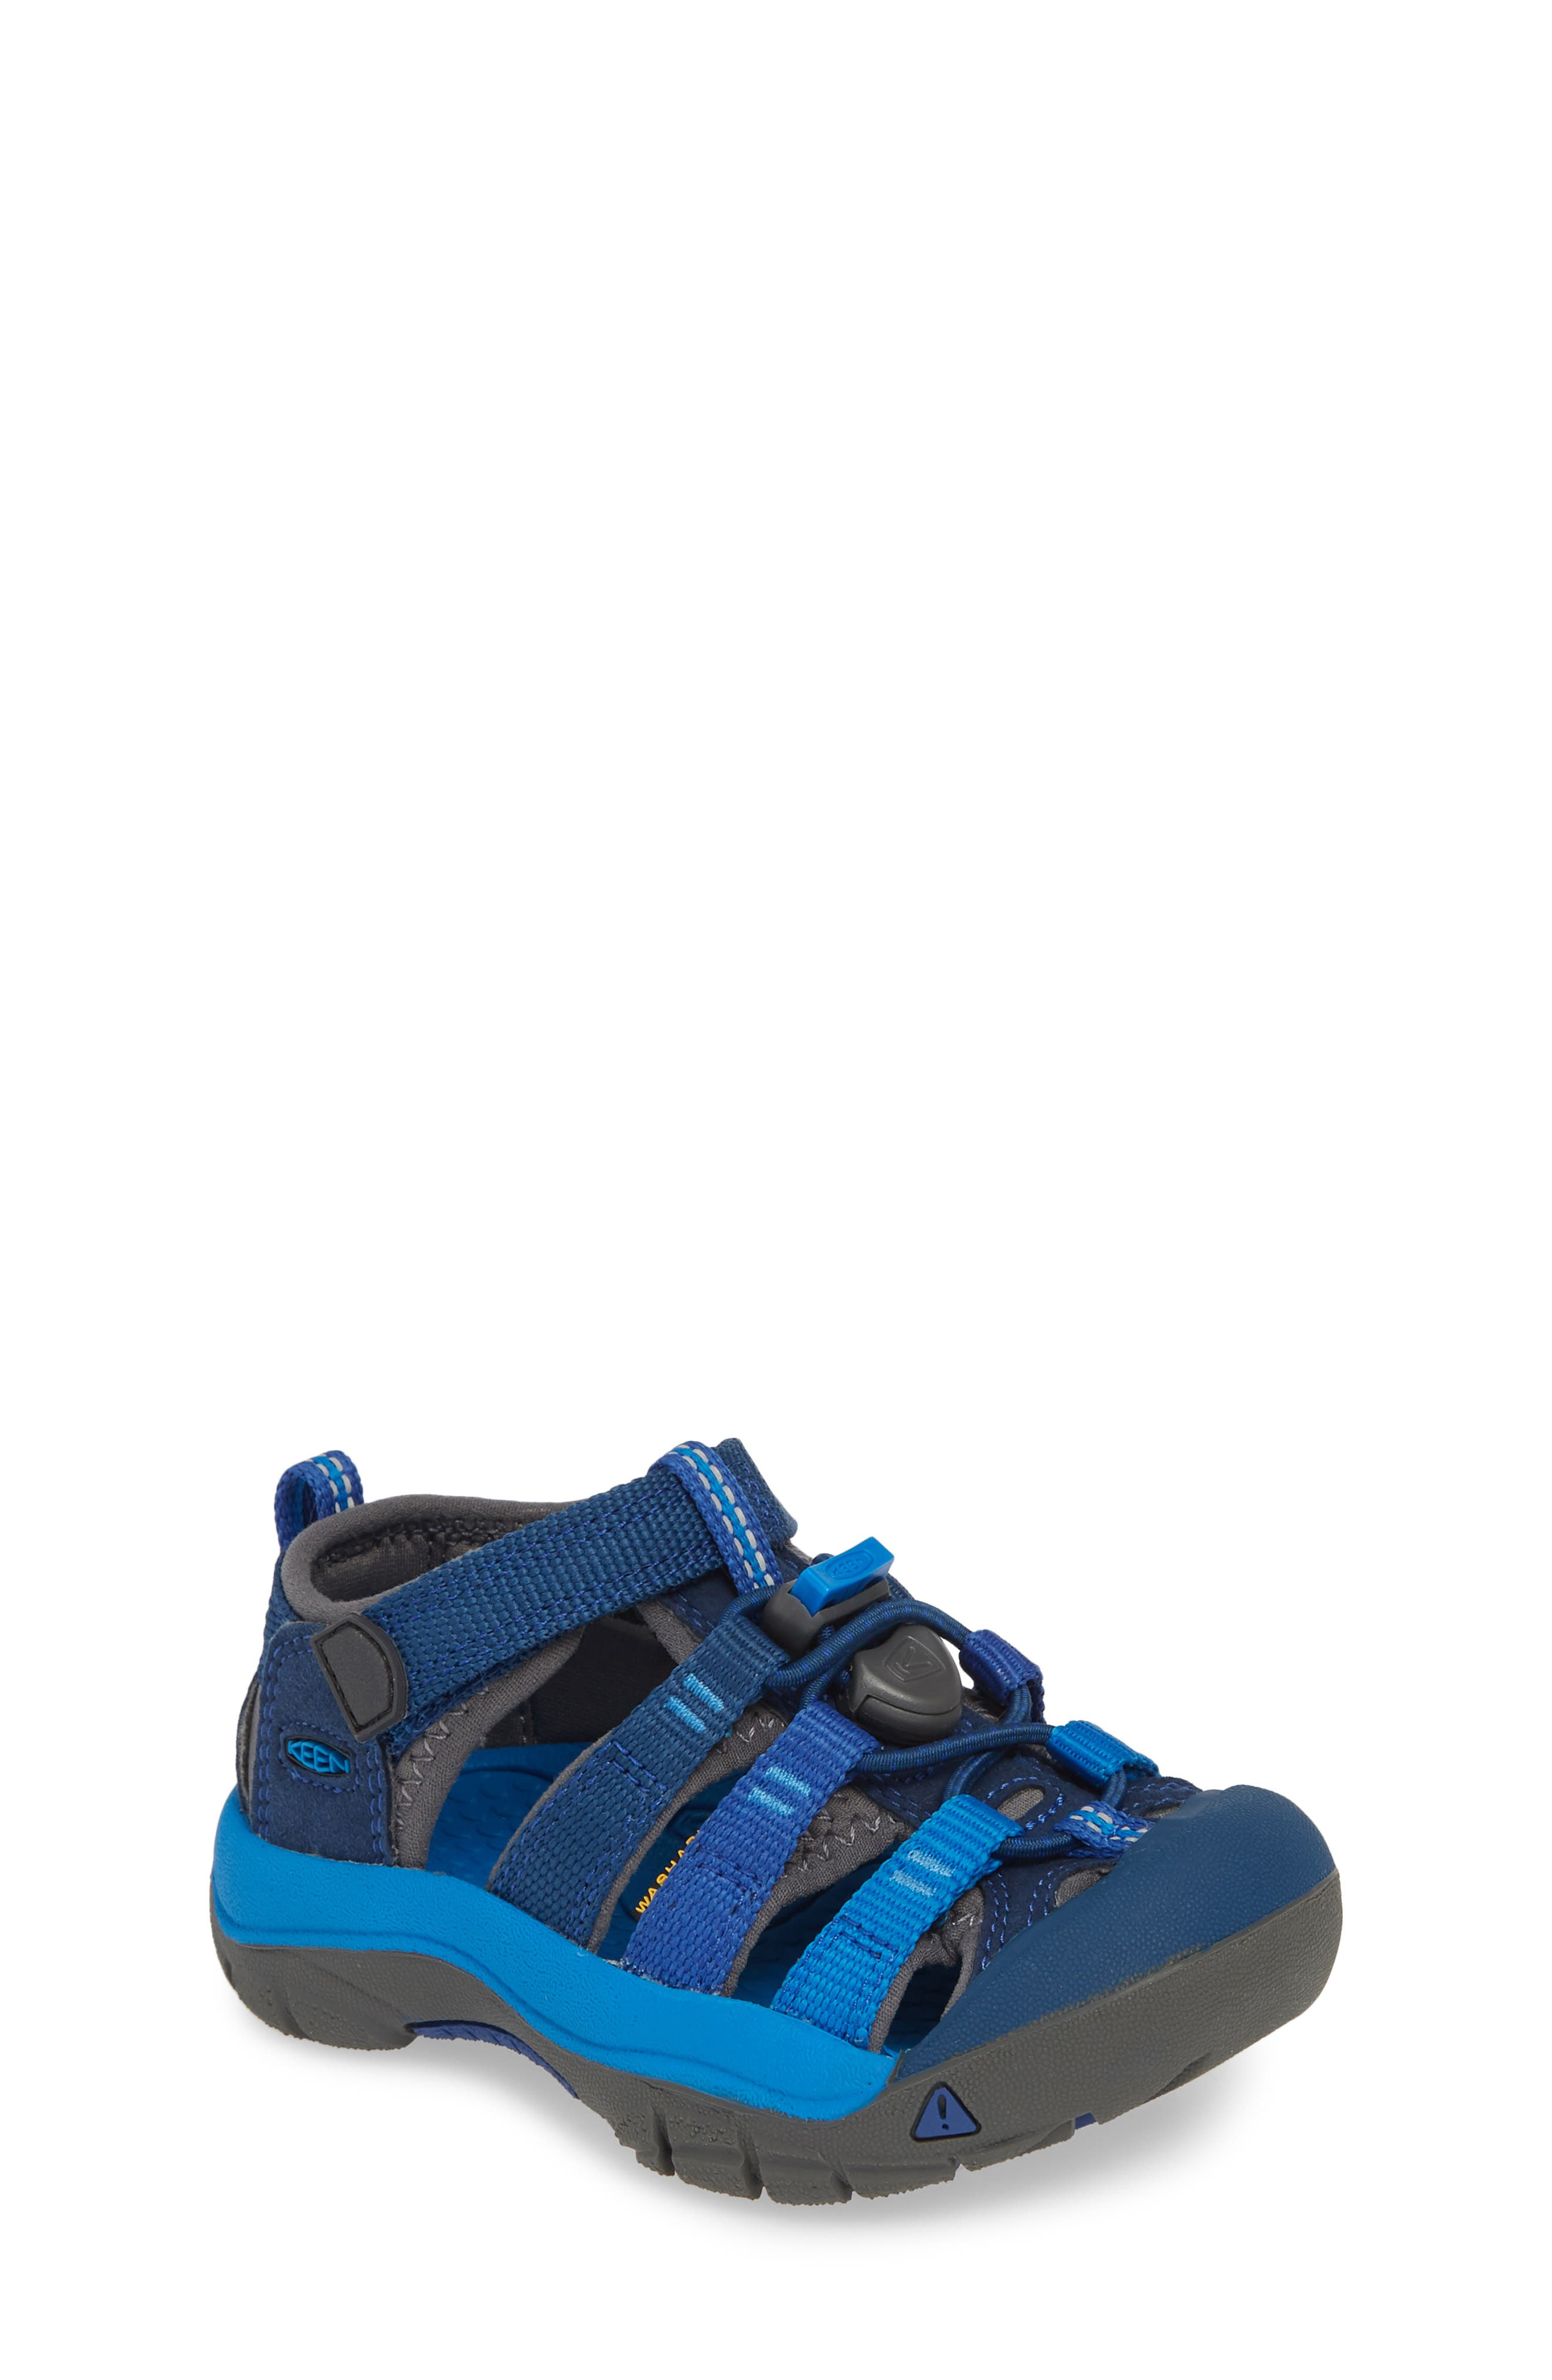 'Newport H2' Water Friendly Sandal, Main, color, BLUE OPAL/ VIBRANT BLUE